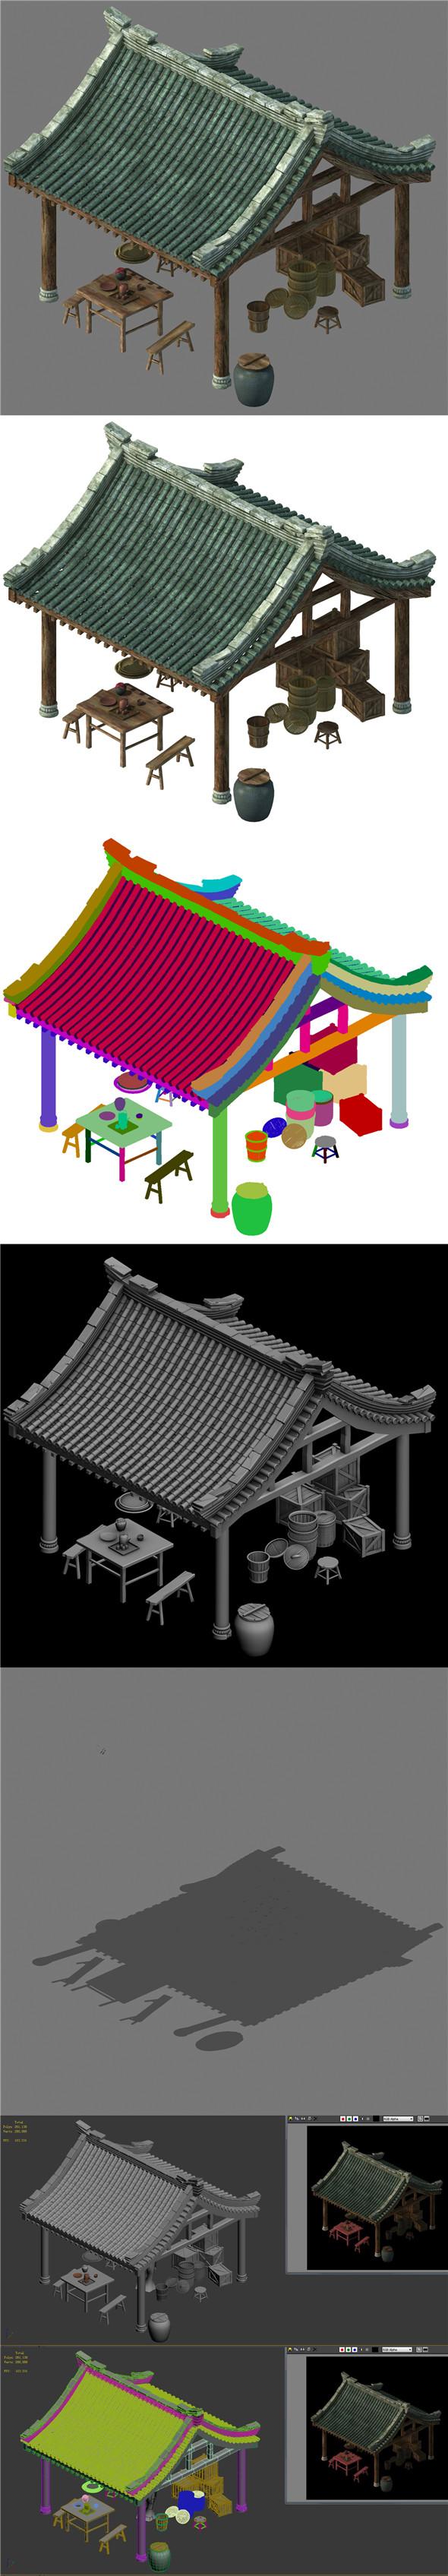 Huaihe River Building - Shop 02 - 3DOcean Item for Sale